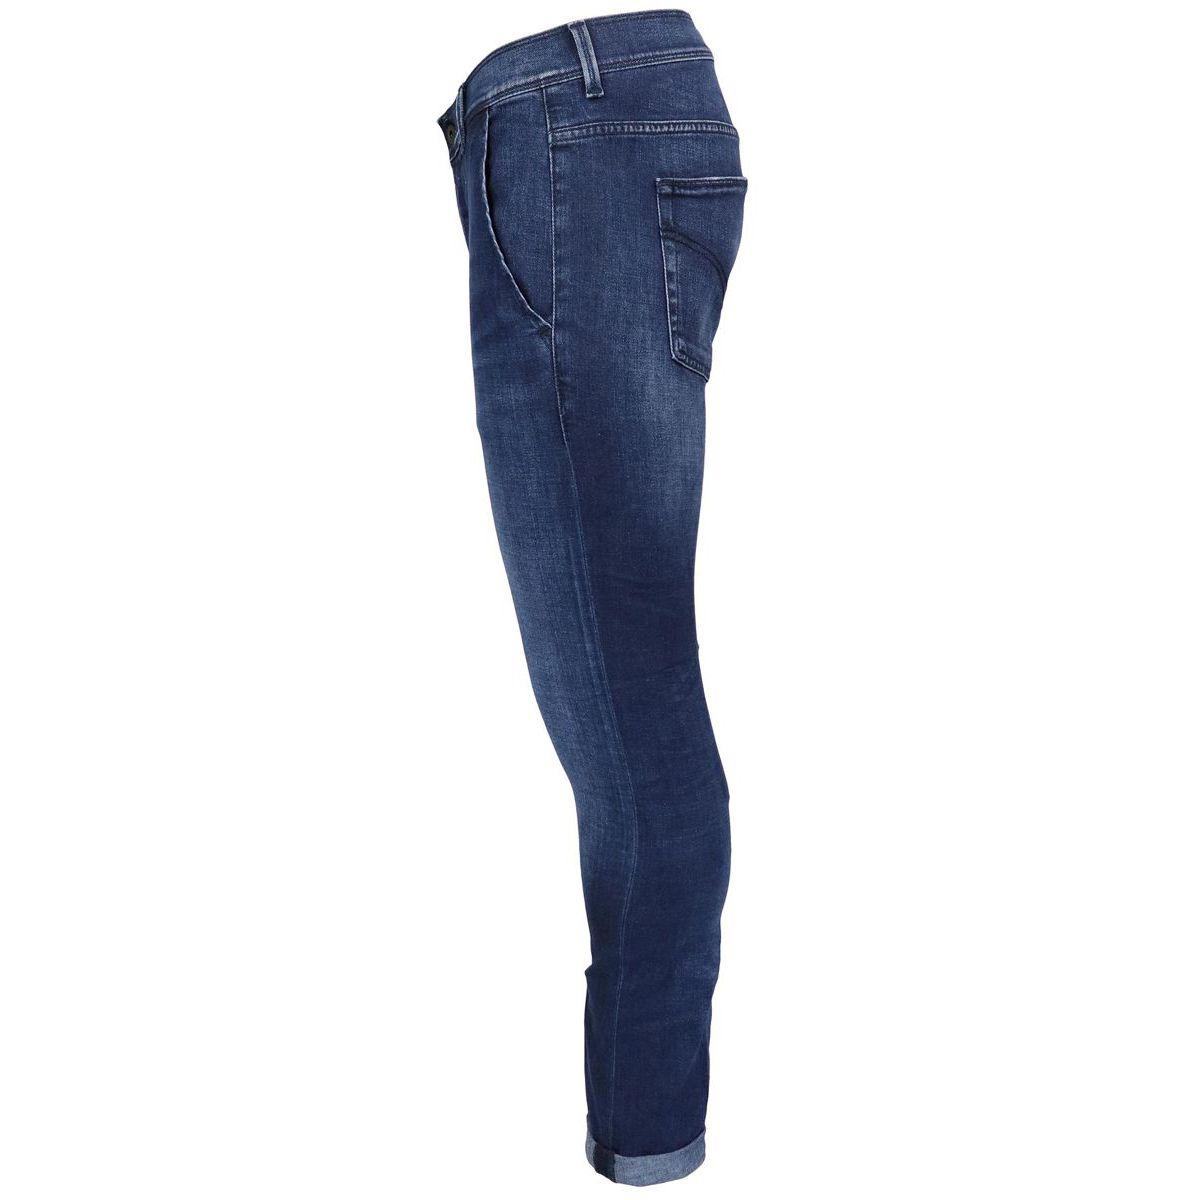 Konor America stretch jeans Denim Dondup